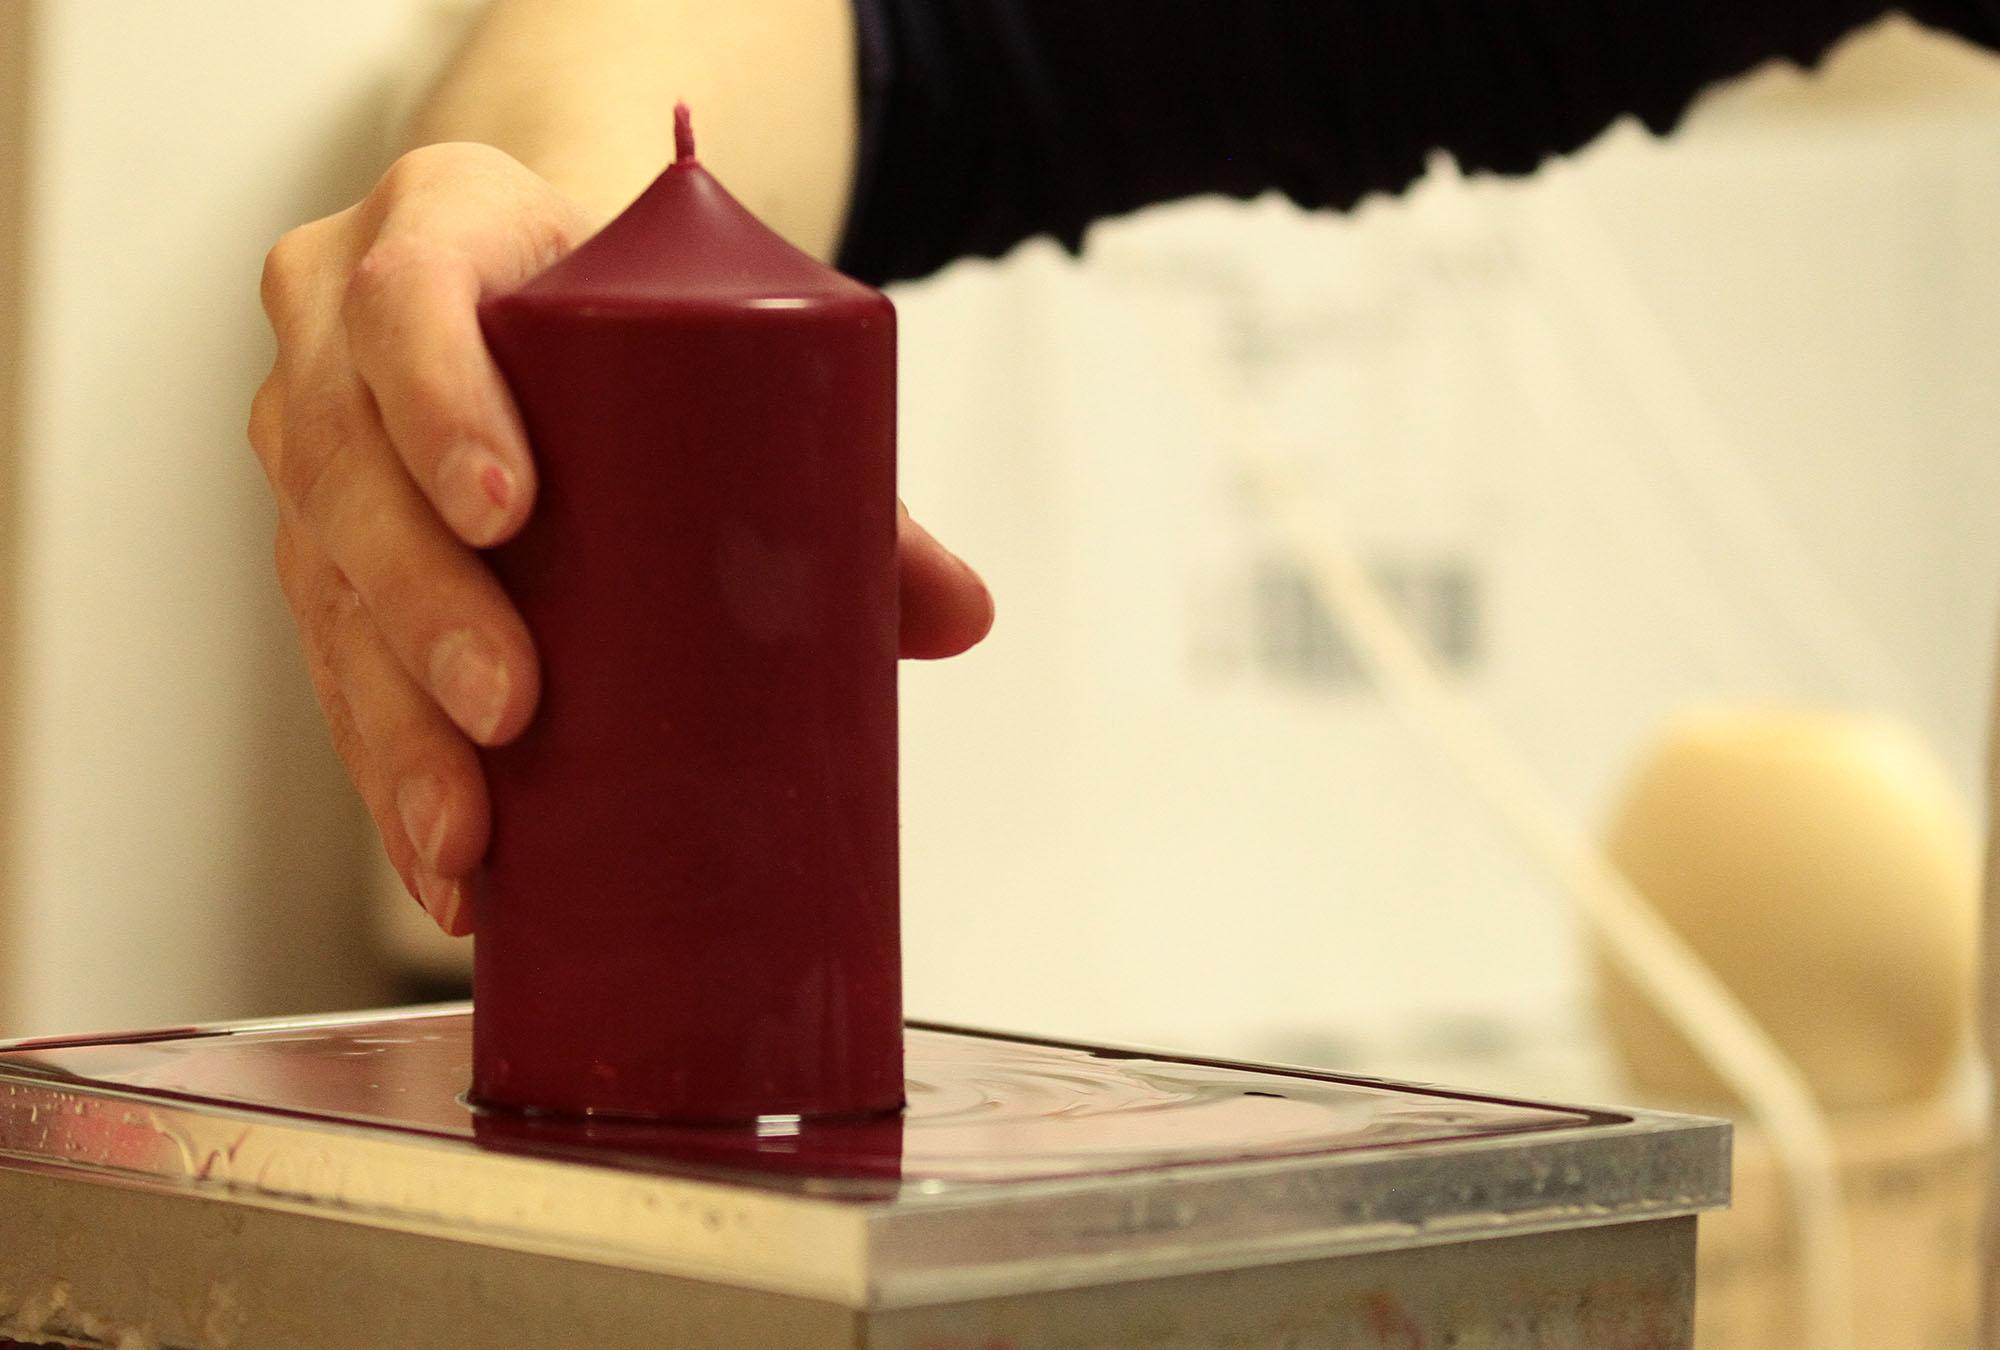 Nach dem Trocknen muss jede Kerze noch begradigt werden.